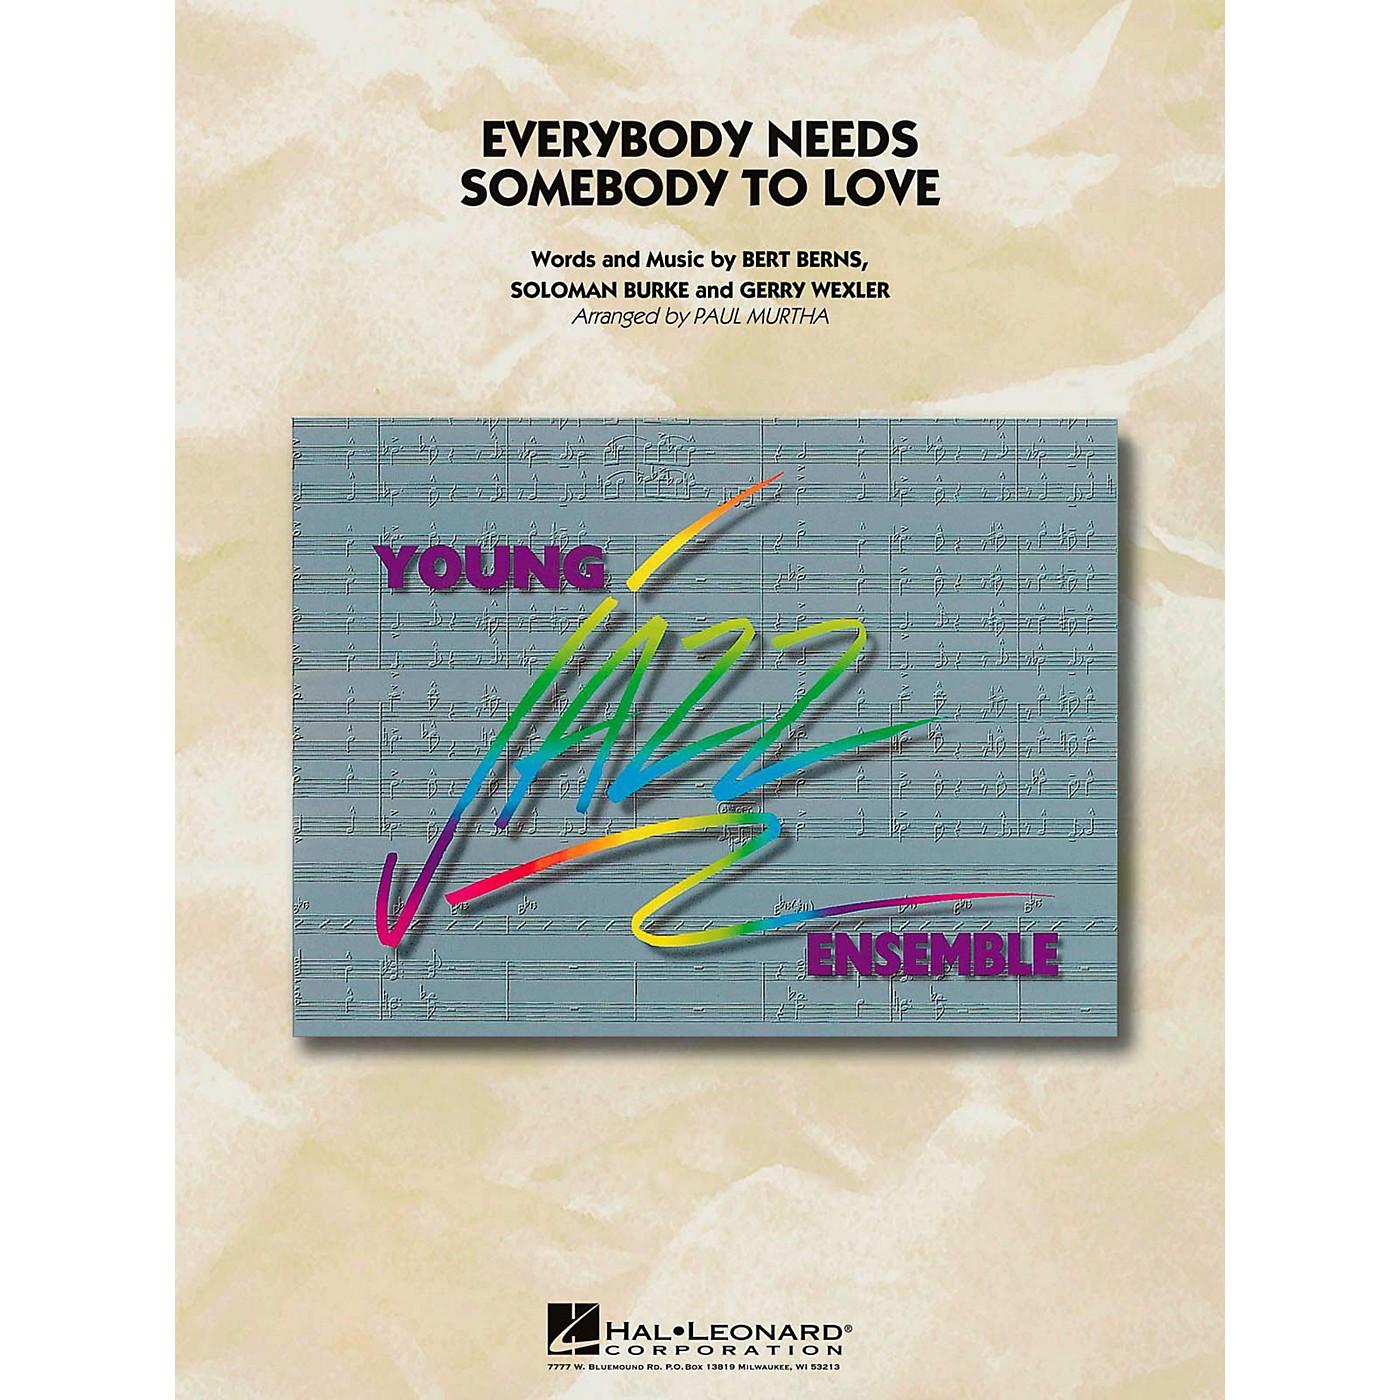 Hal Leonard Everybody Needs Somebody To Love Jazz Band Level 3 thumbnail